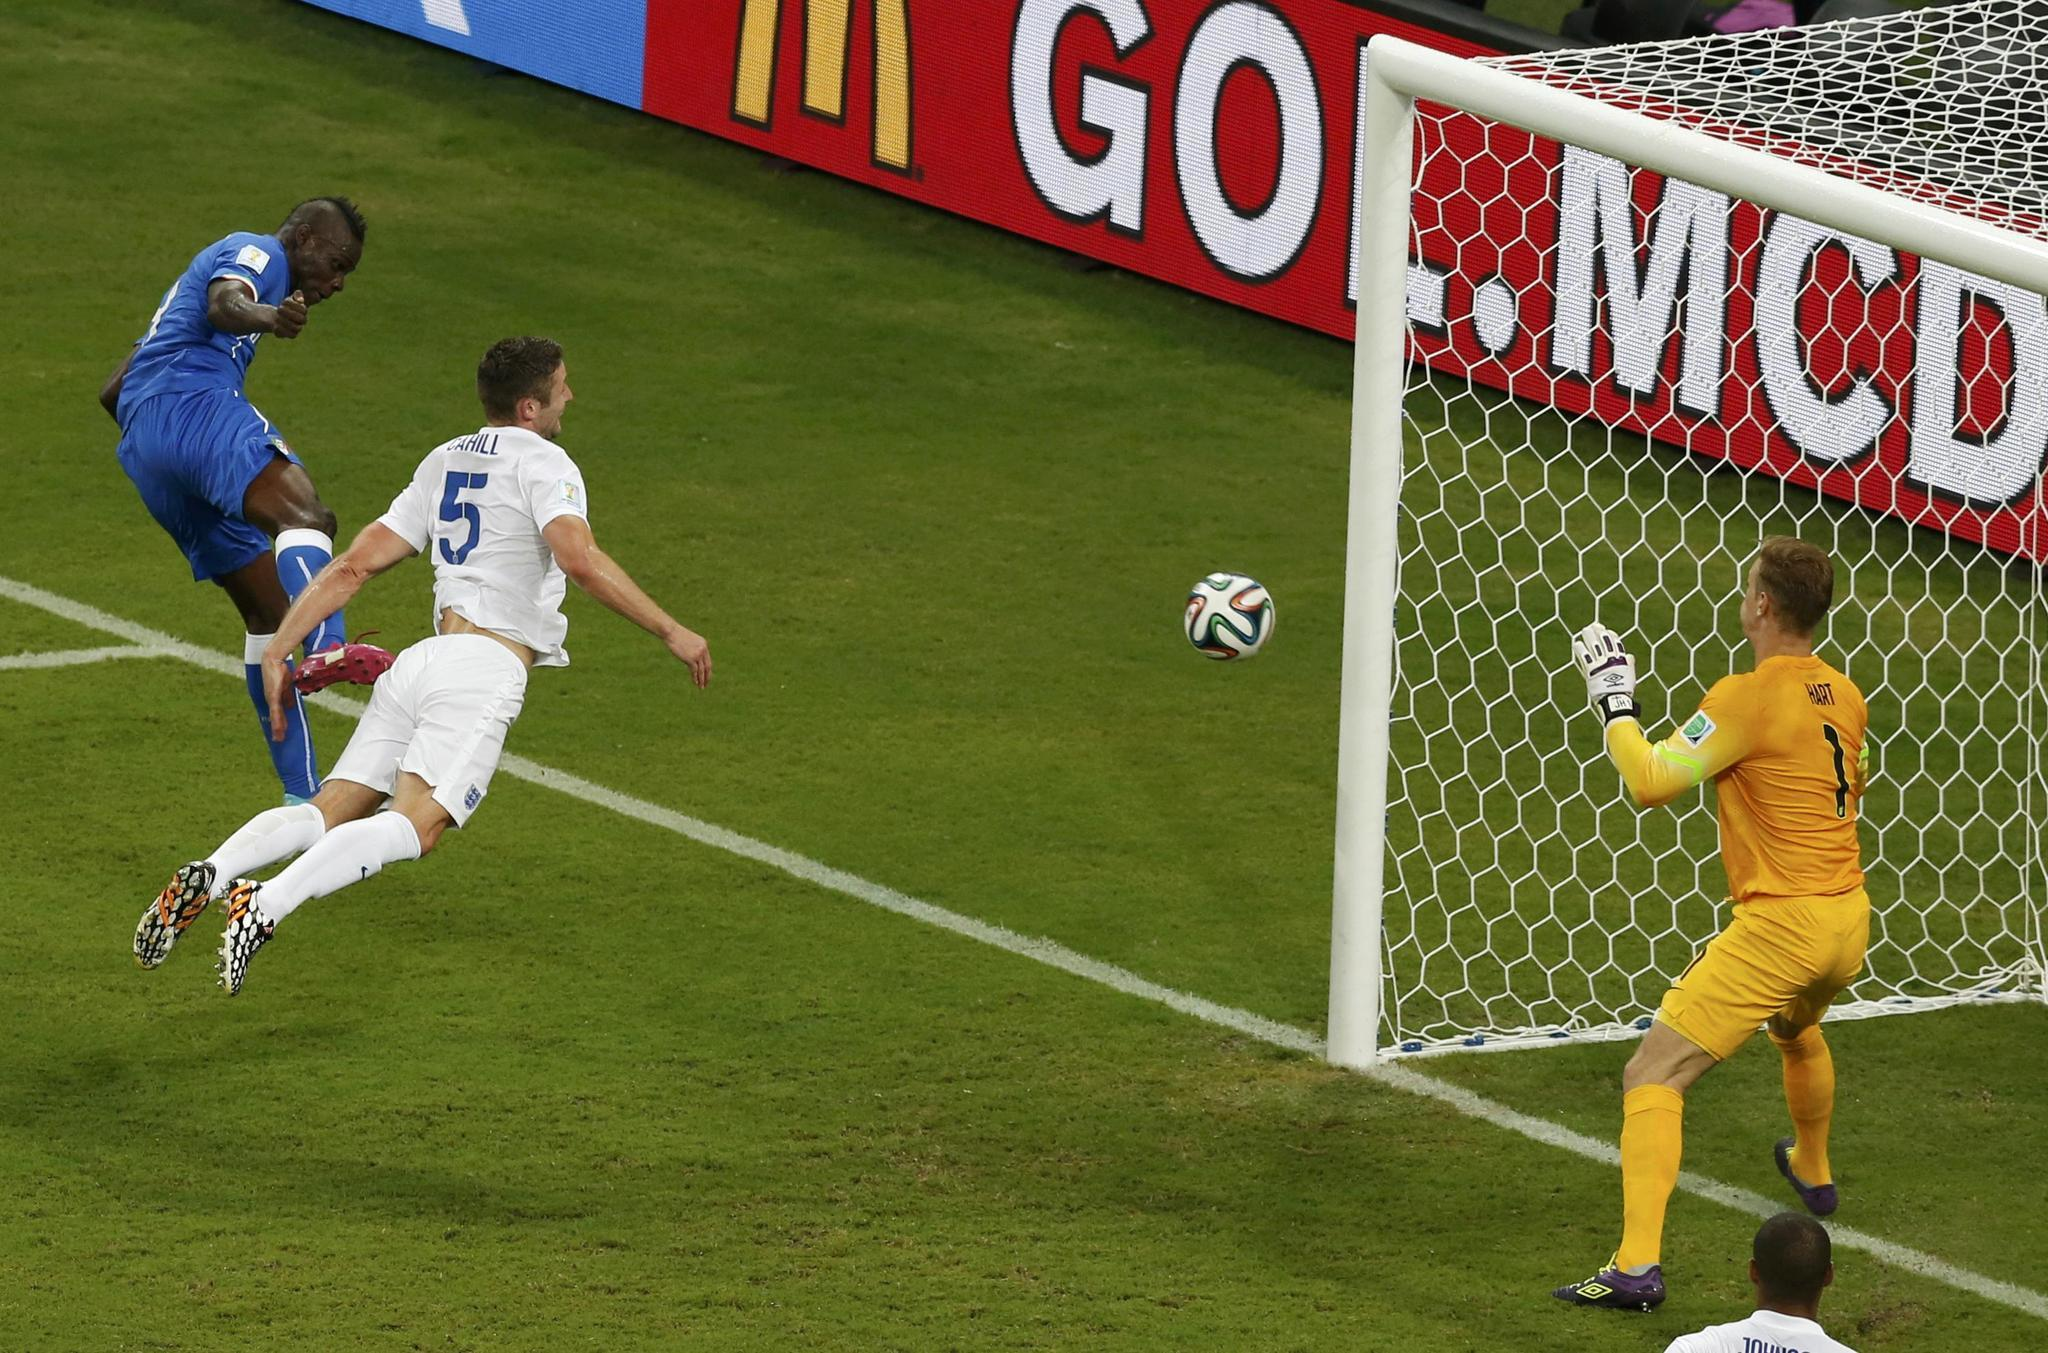 Italy's Mario Balotelli scores against England.